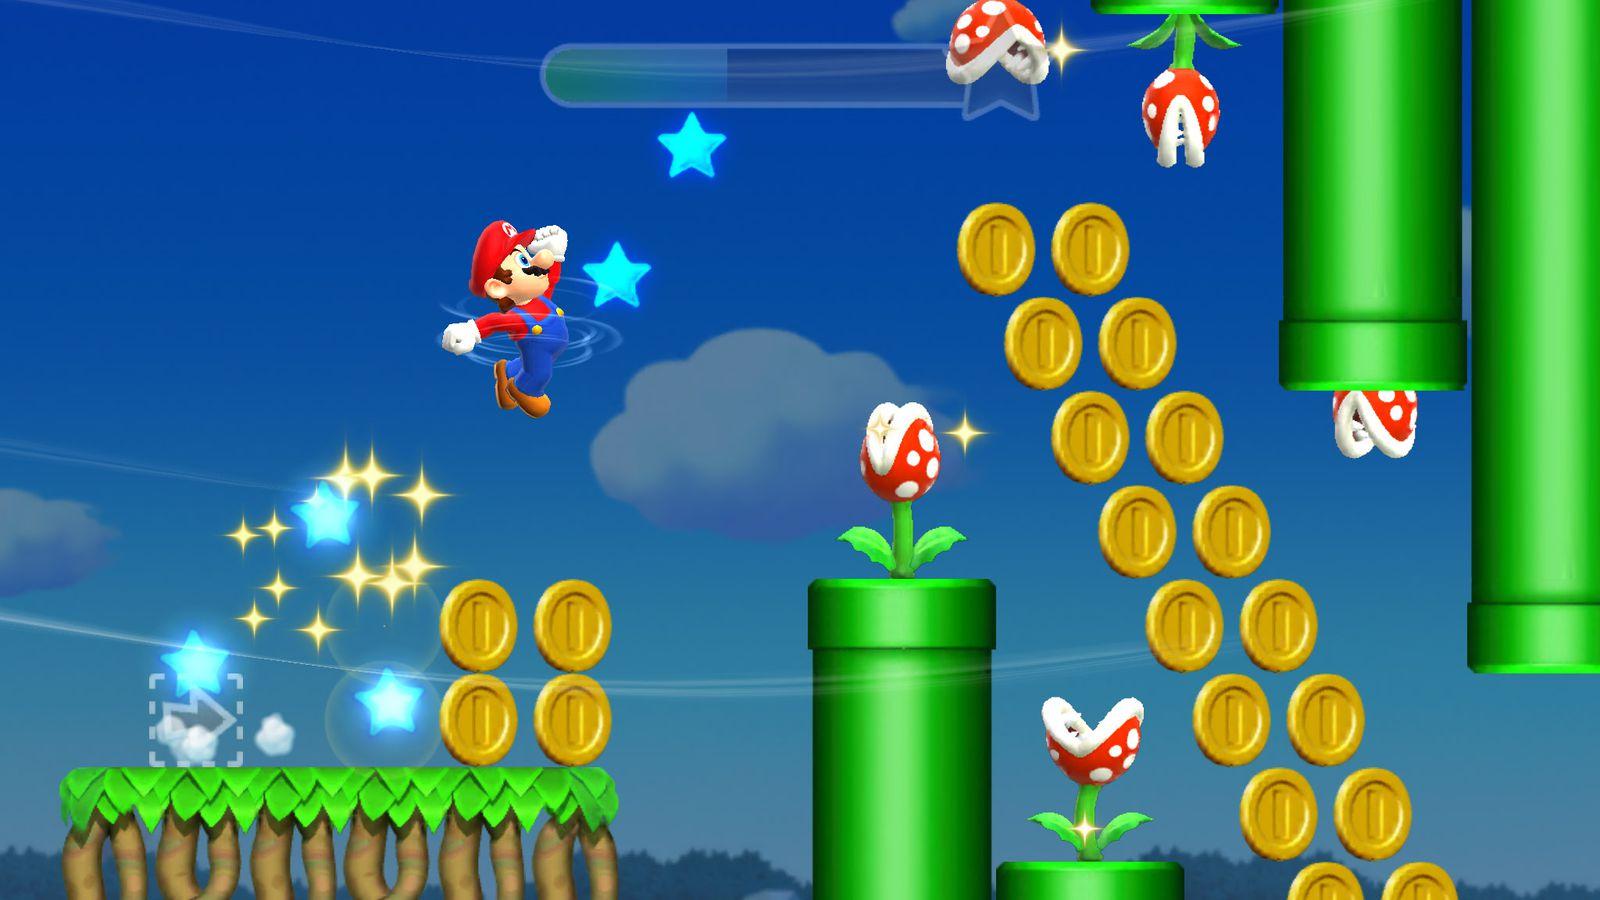 Spiele Kostenlos Super Mario